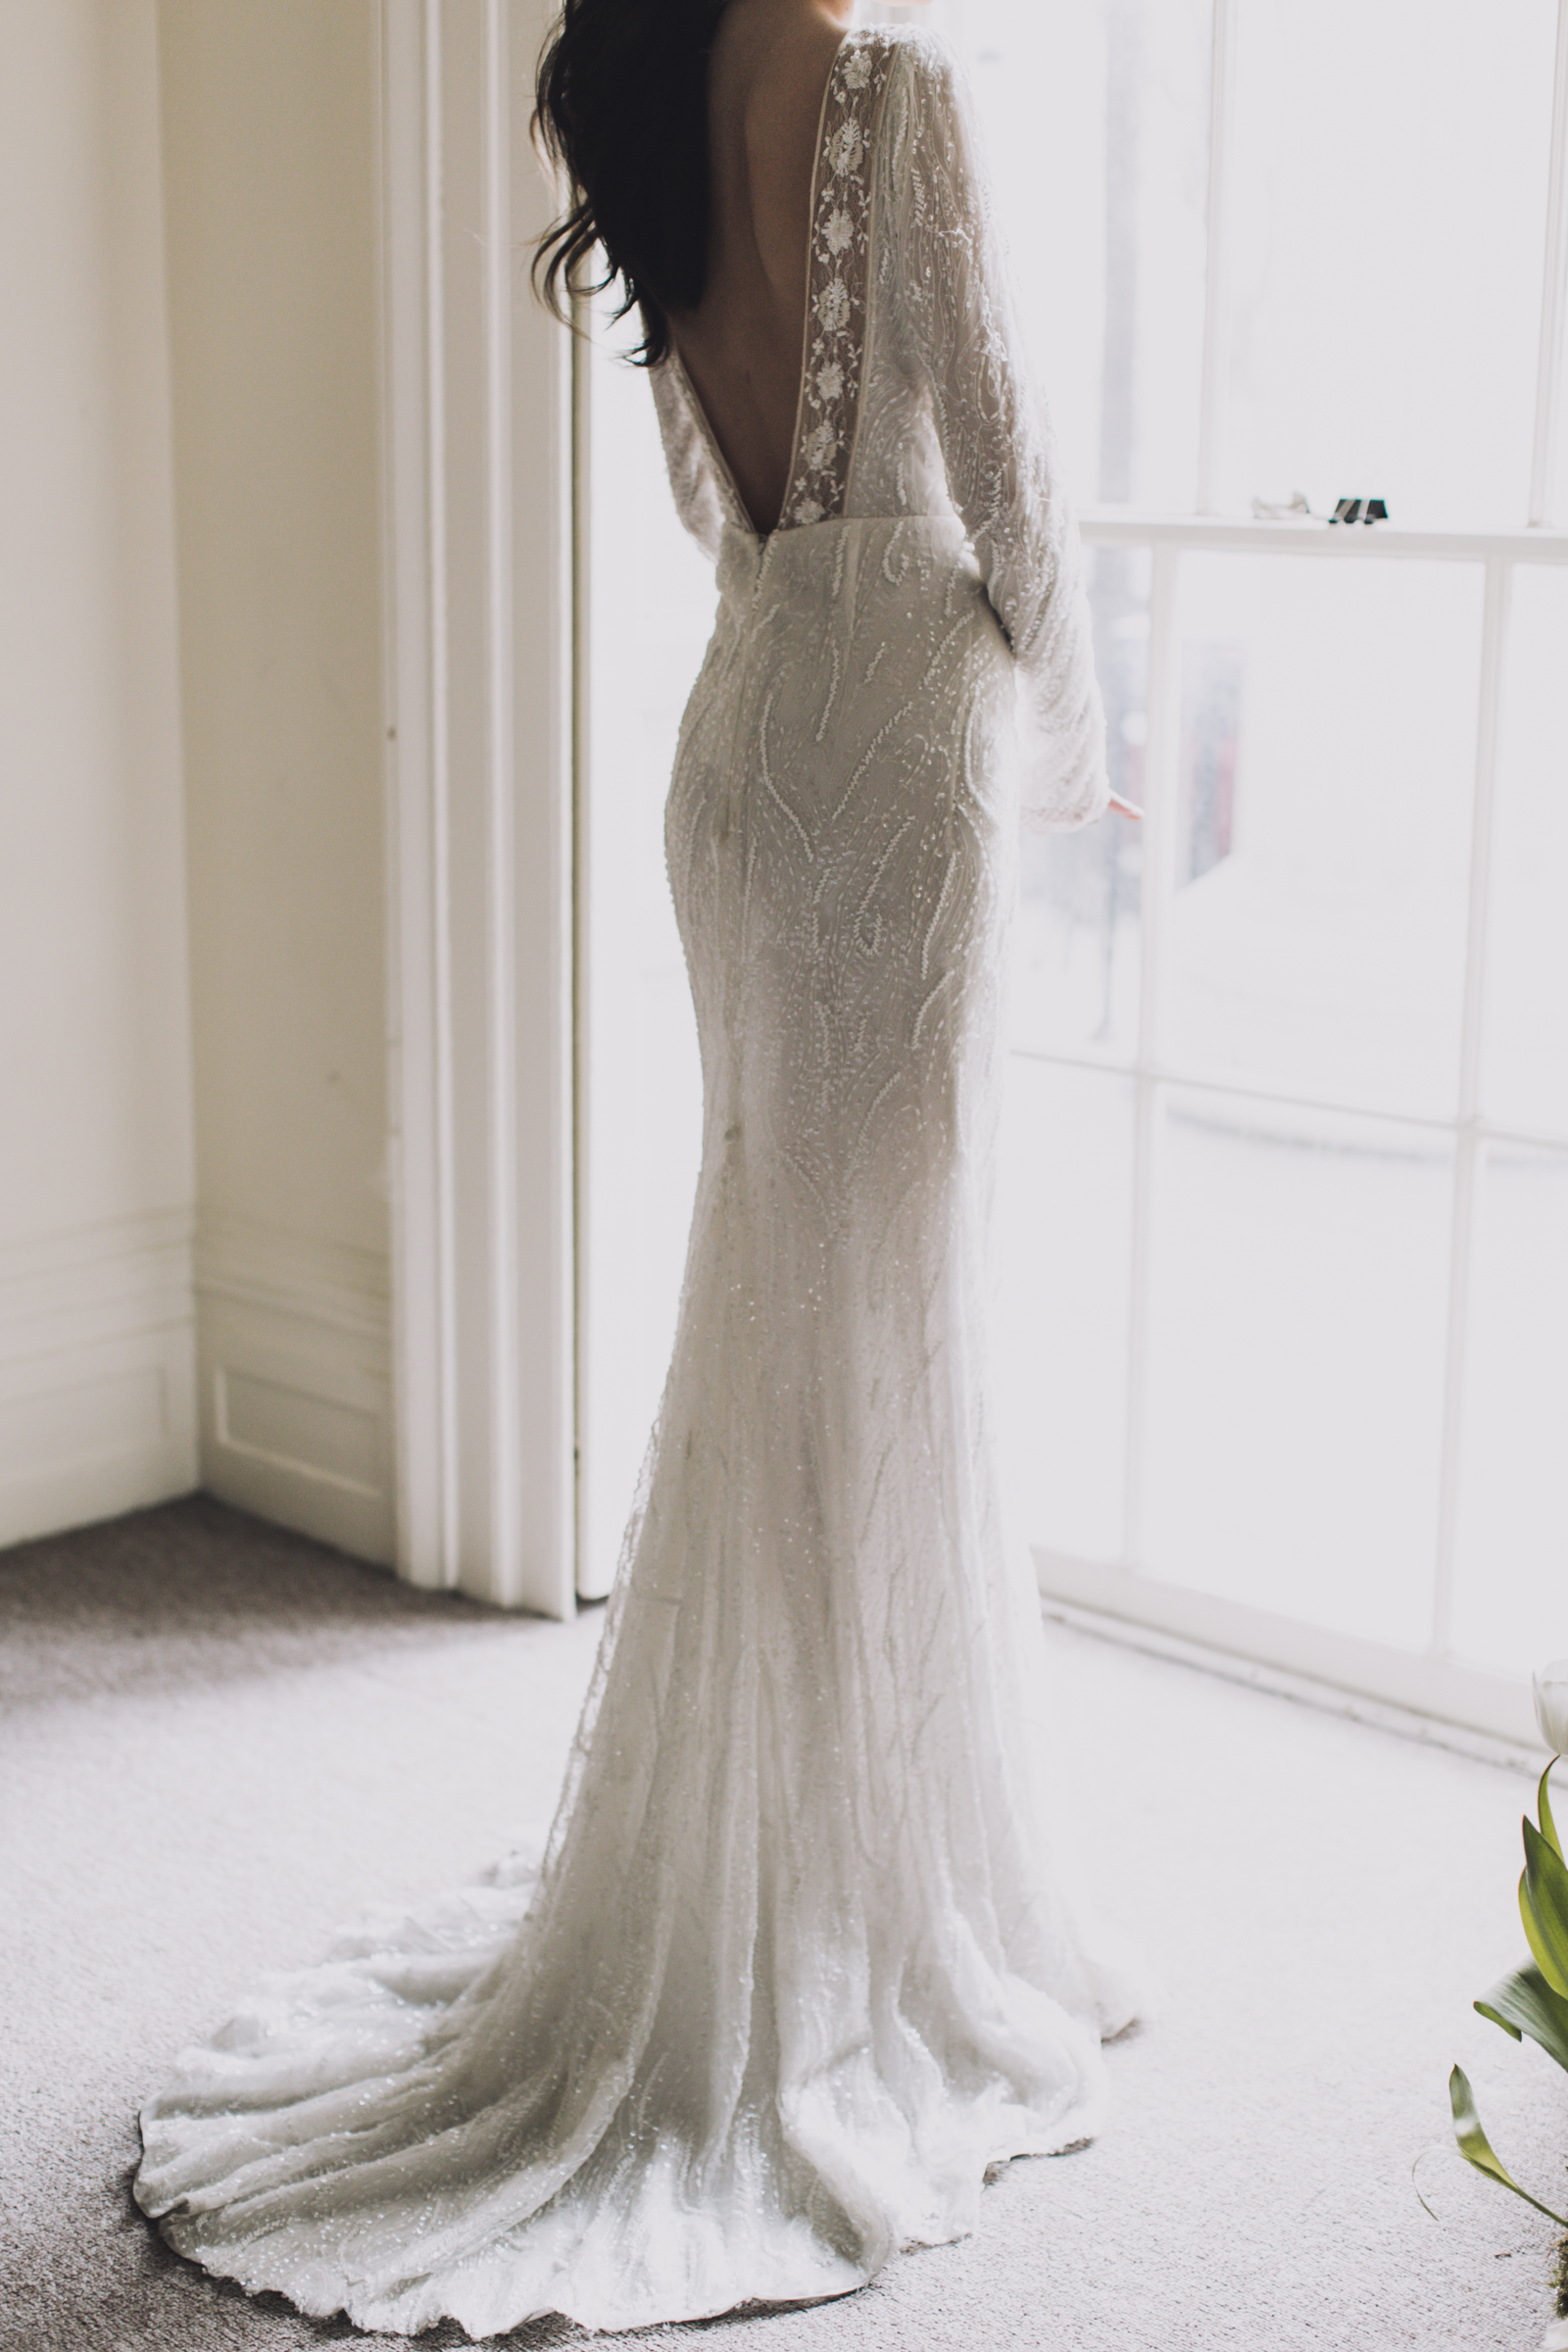 20160310-029-Barrow_Mansion_Wedding_Editorial.jpg